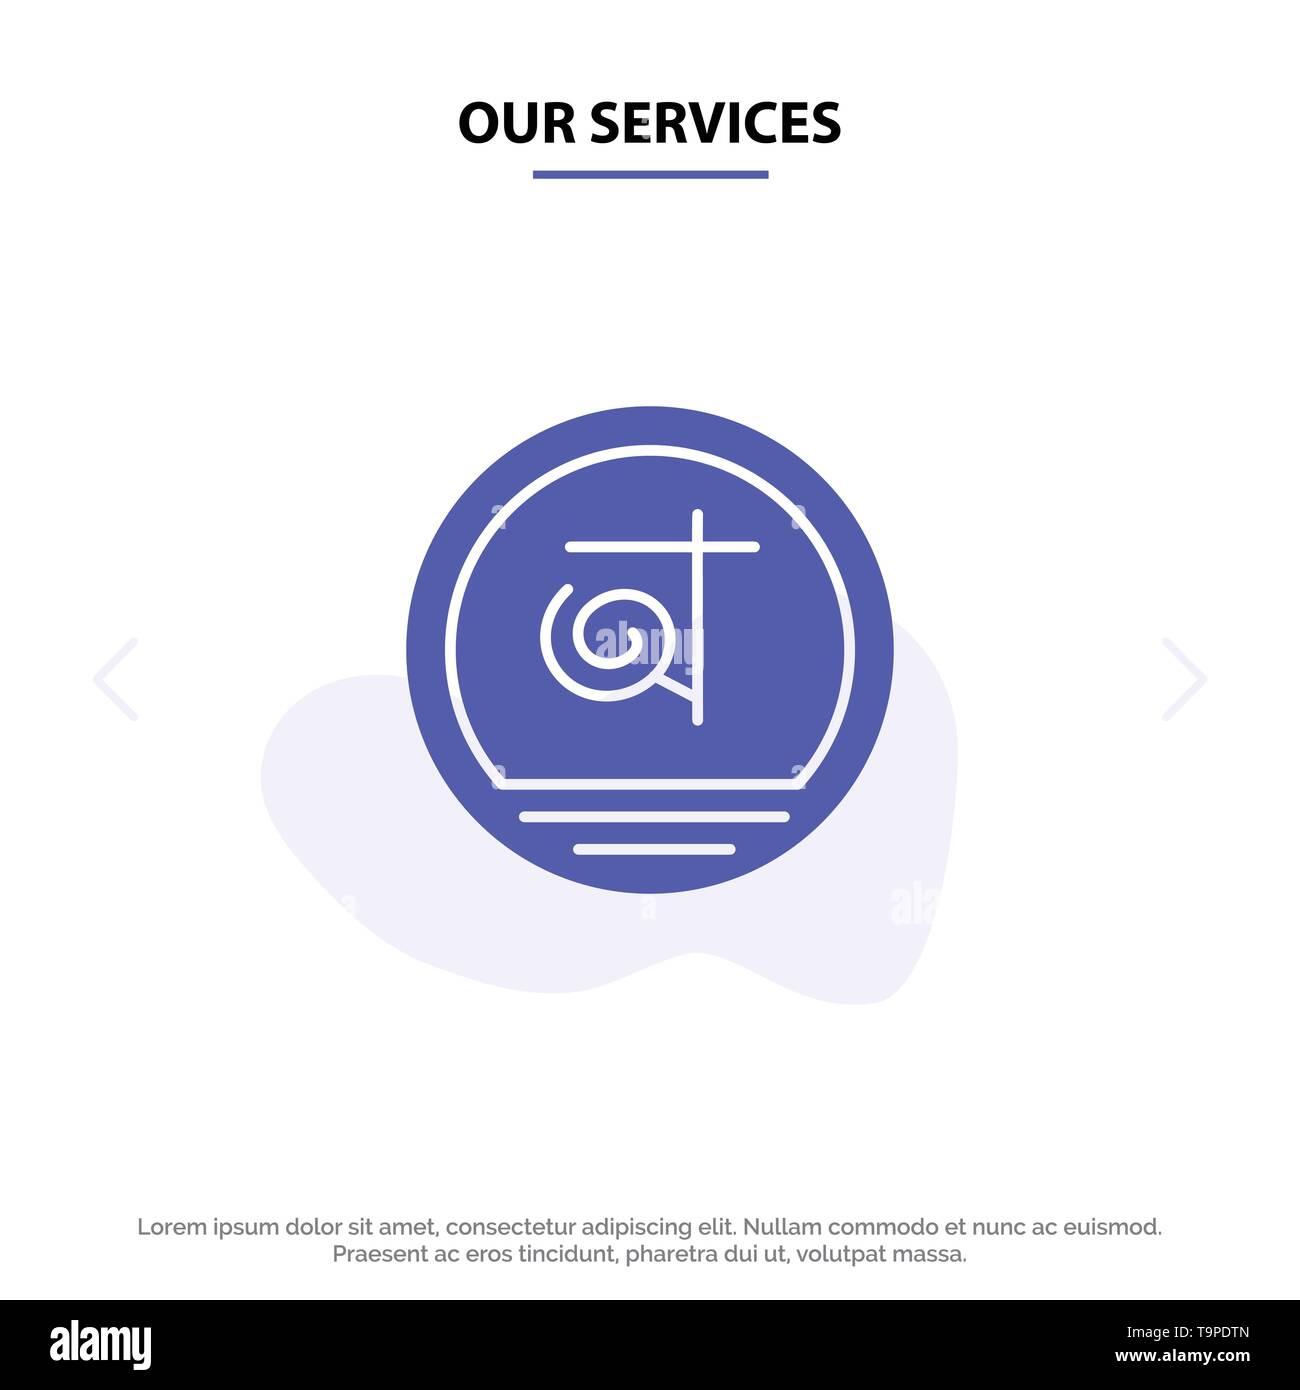 Our Services Bangla, Bangladesh, Bangladeshi, Business Solid Glyph Icon Web card Template - Stock Image